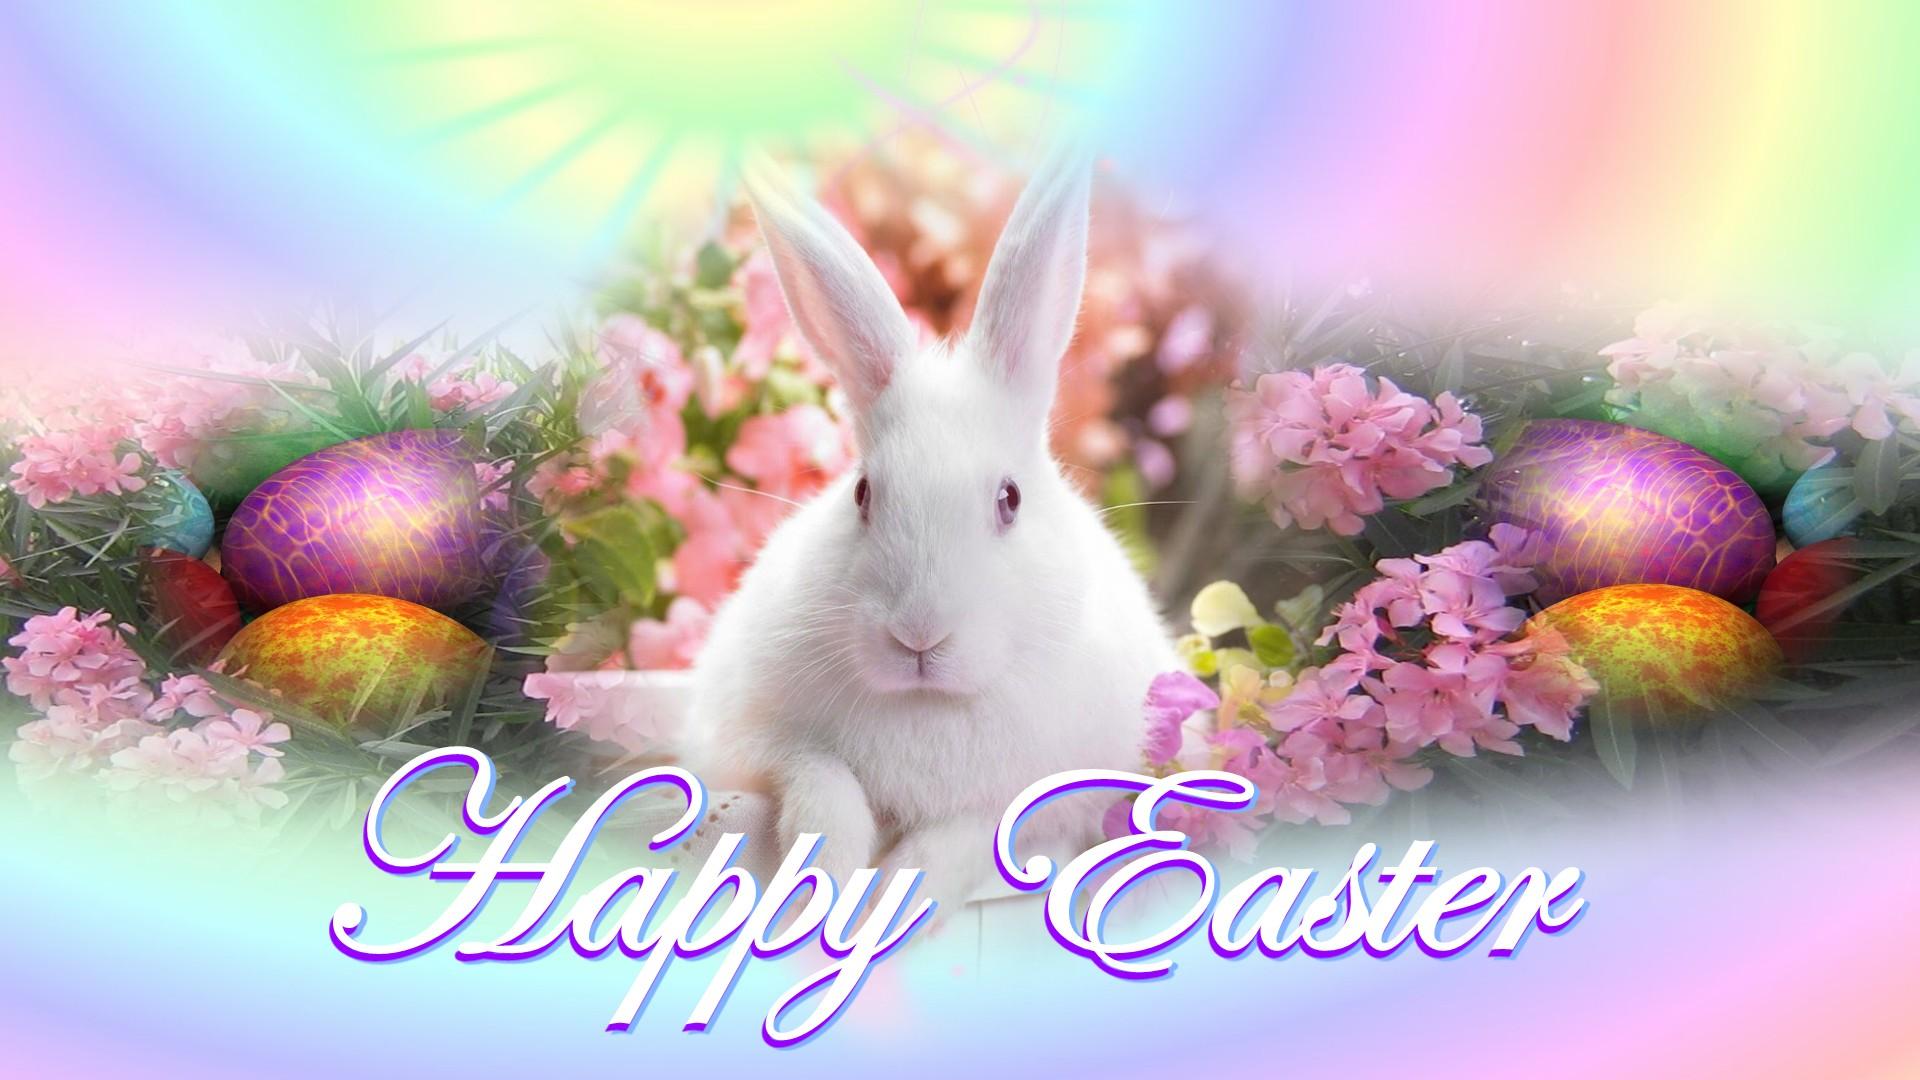 bunny 2016 easter 4k - photo #12